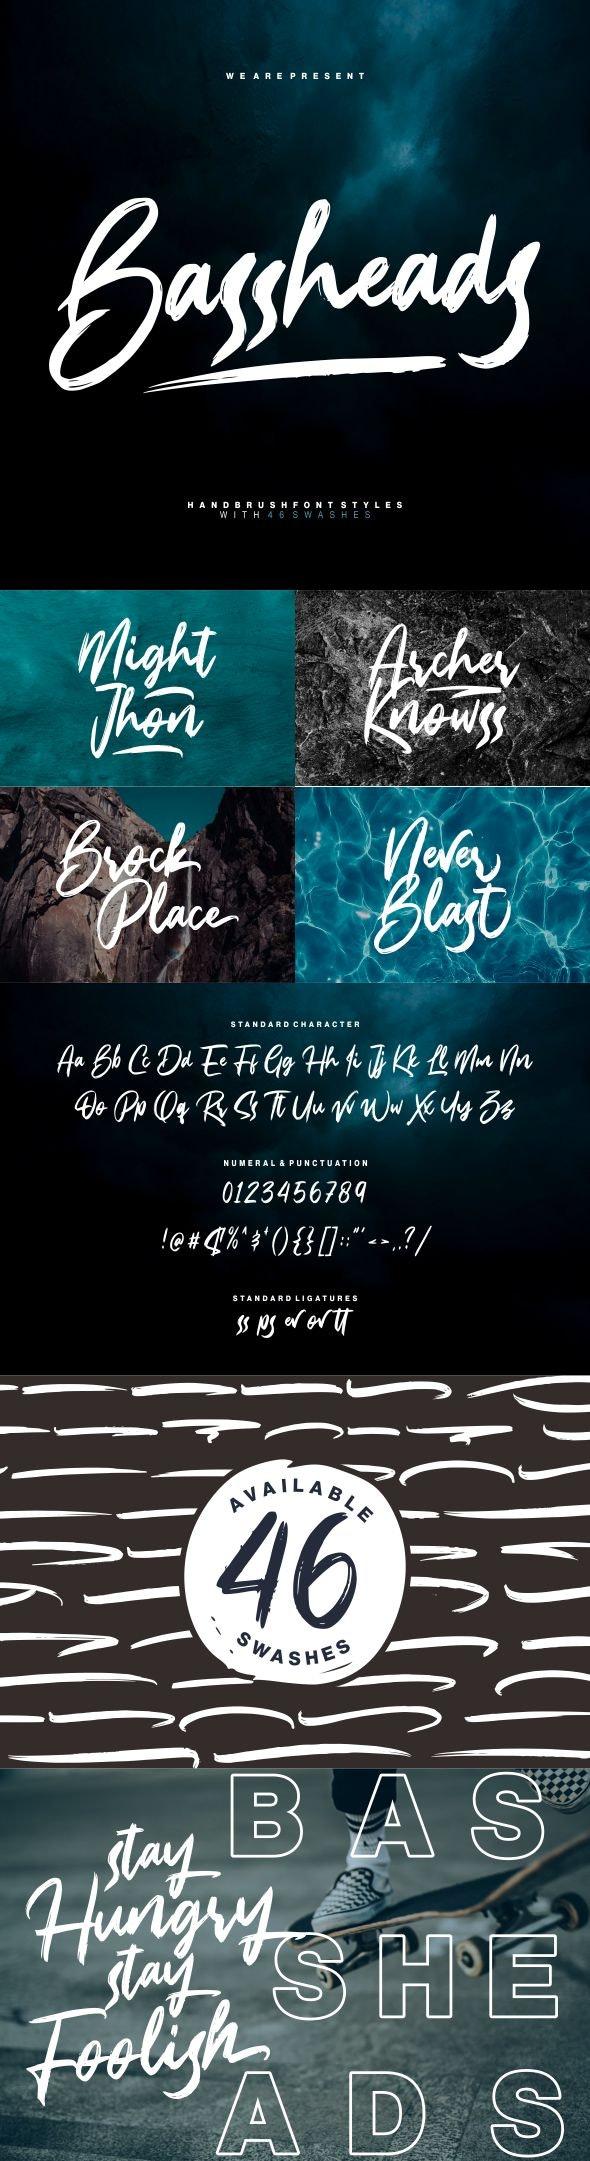 Bassheads - Hand-writing Script